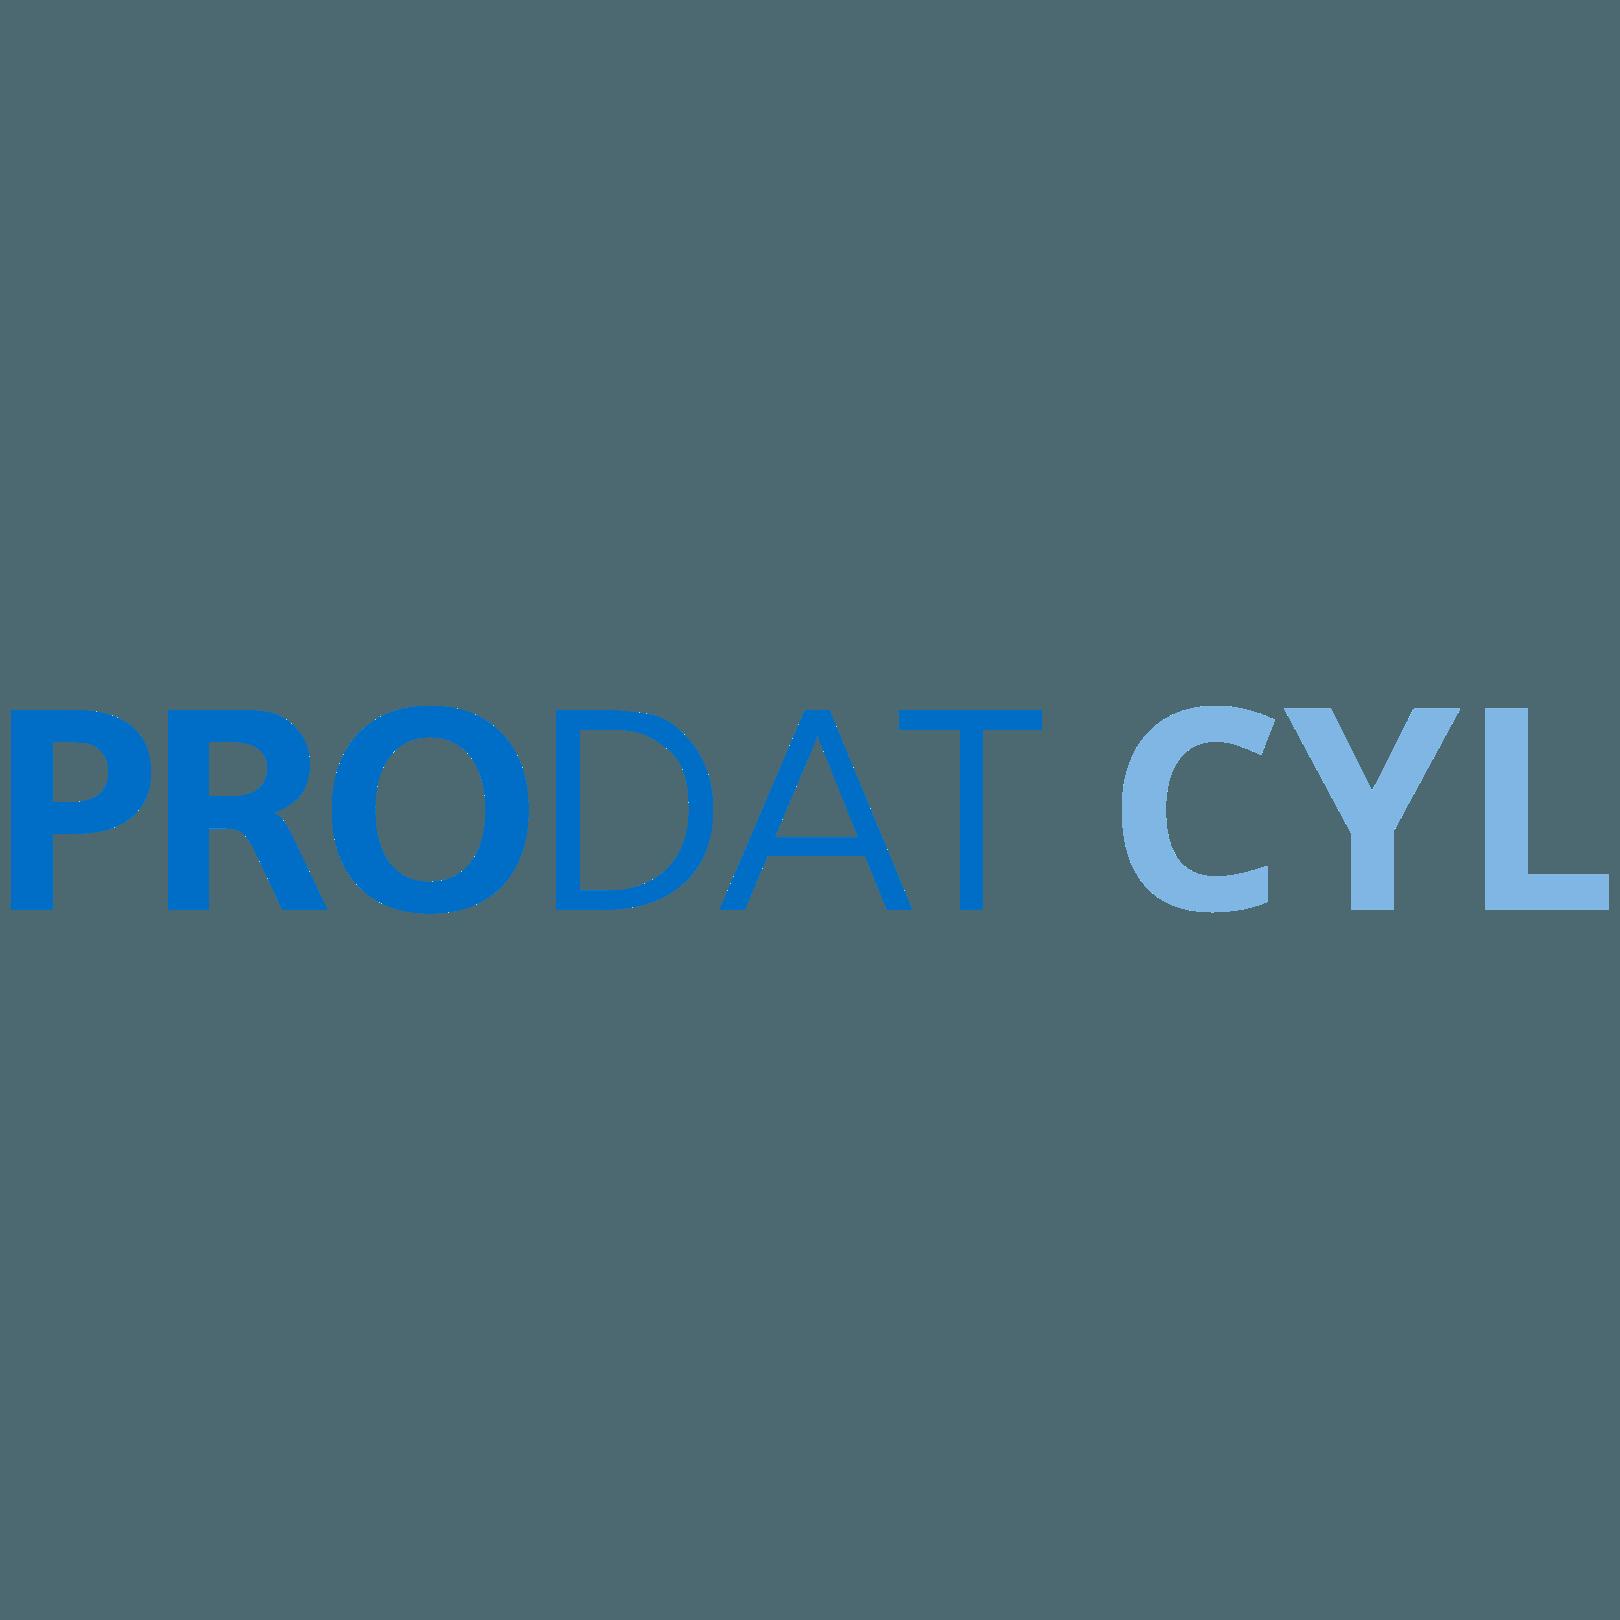 Prodacyl